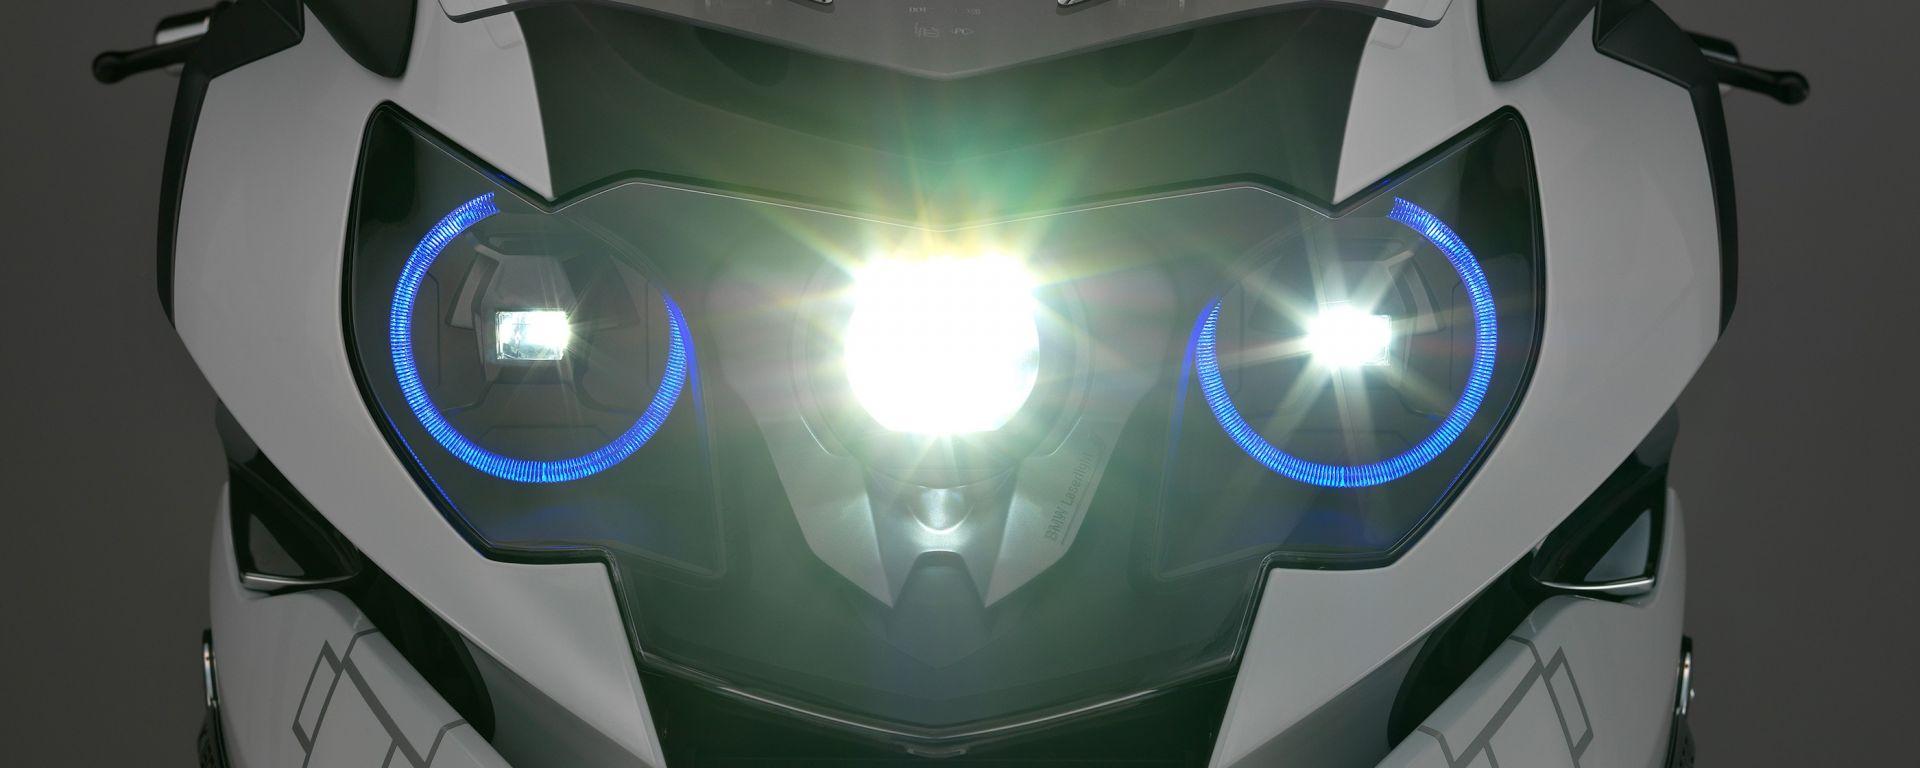 BMW Motorrad: fari laser e casco con head-up display